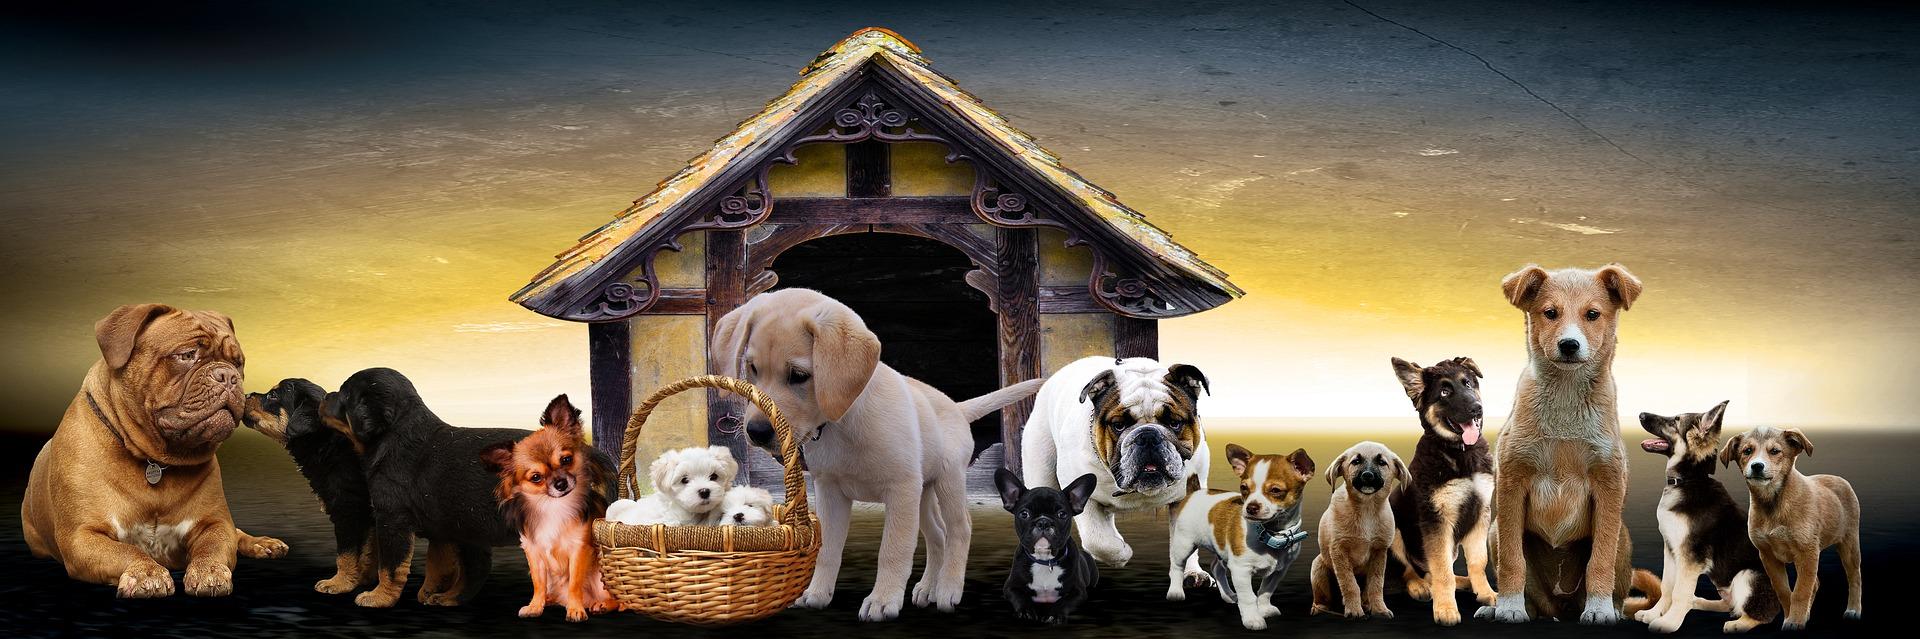 peluqueria canina a domicilio en La Carolina